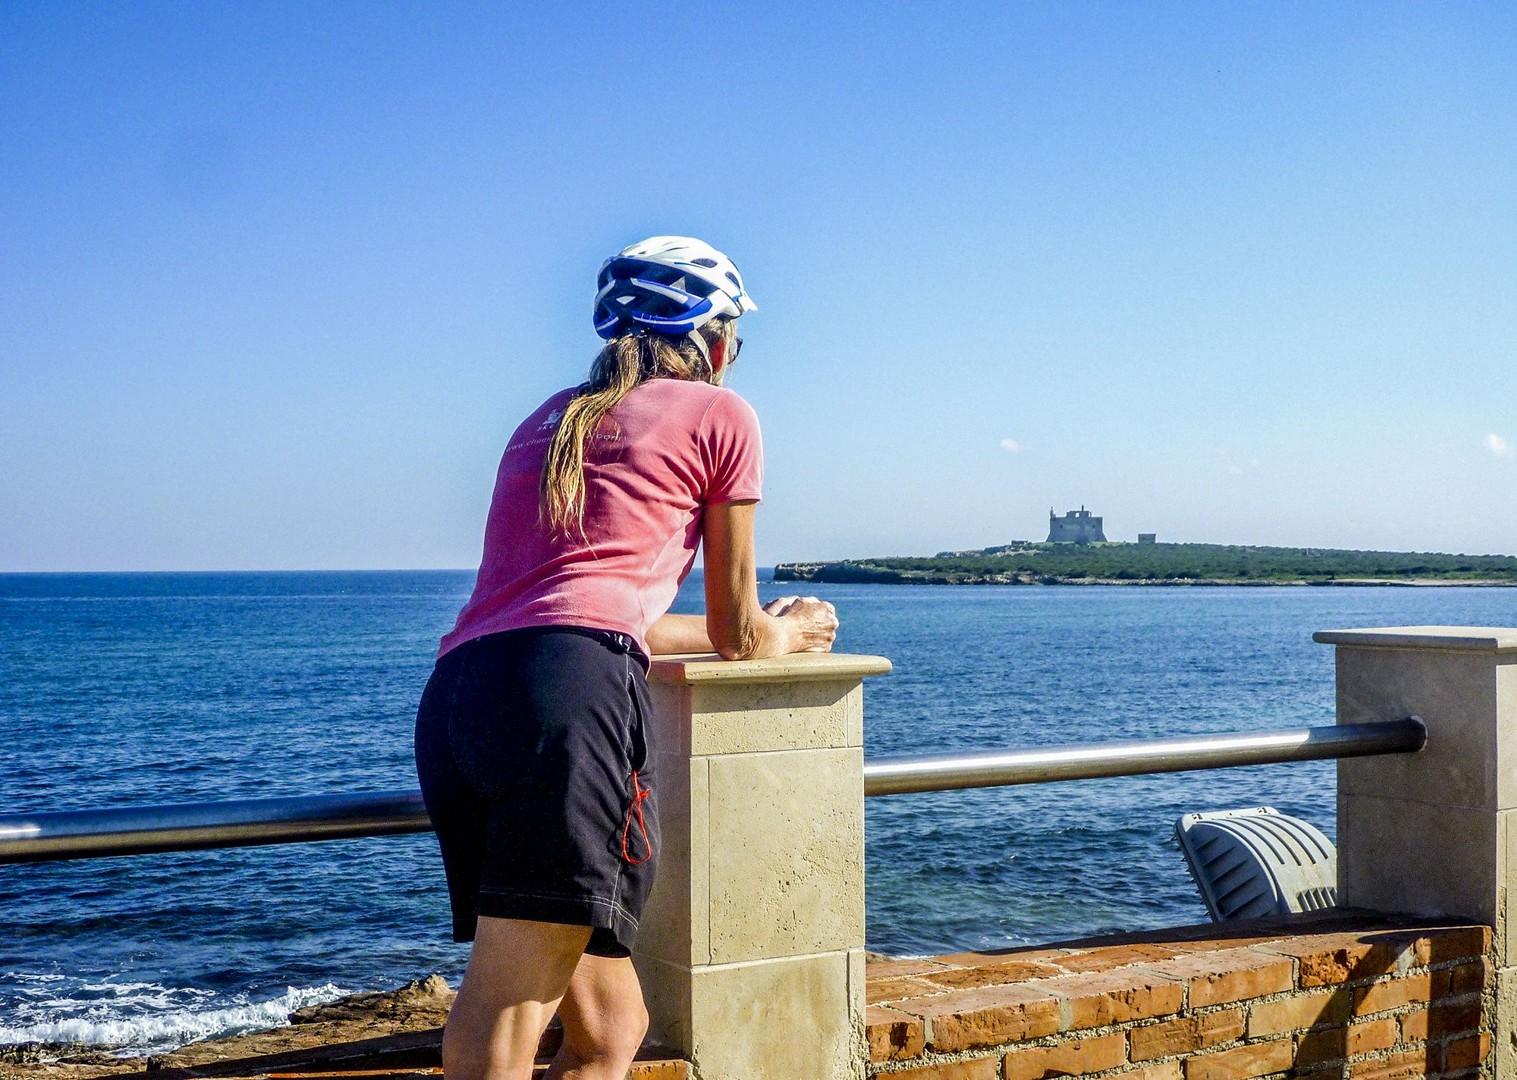 incredible-coastal-scenery-sicily-italy-capo-passero.jpg - Italy - Sicily - Self-Guided Leisure Cycling Holiday - Italia Leisure and Family Cycling